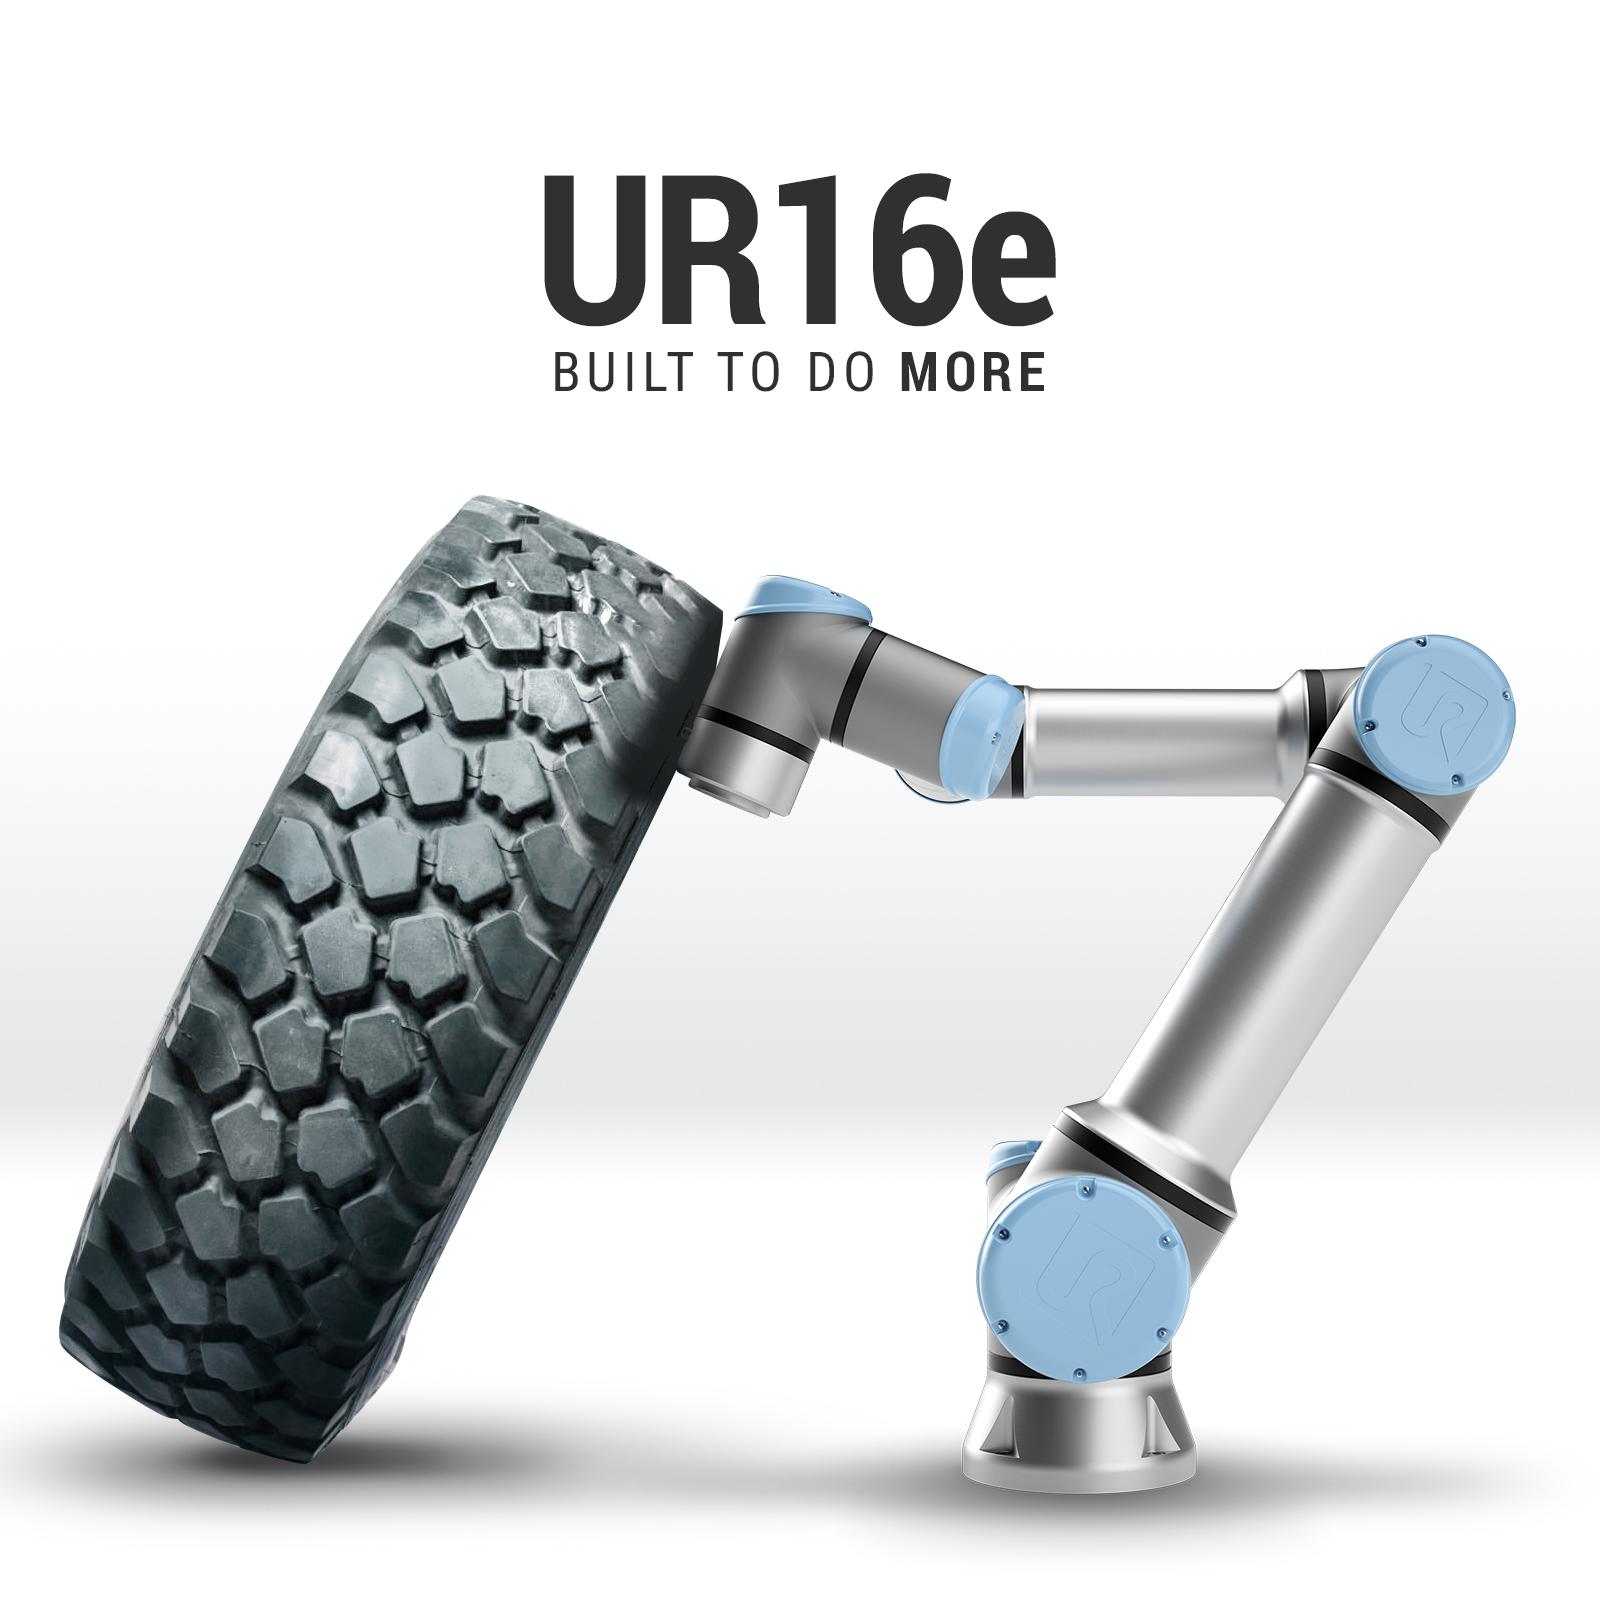 UR16e tire text